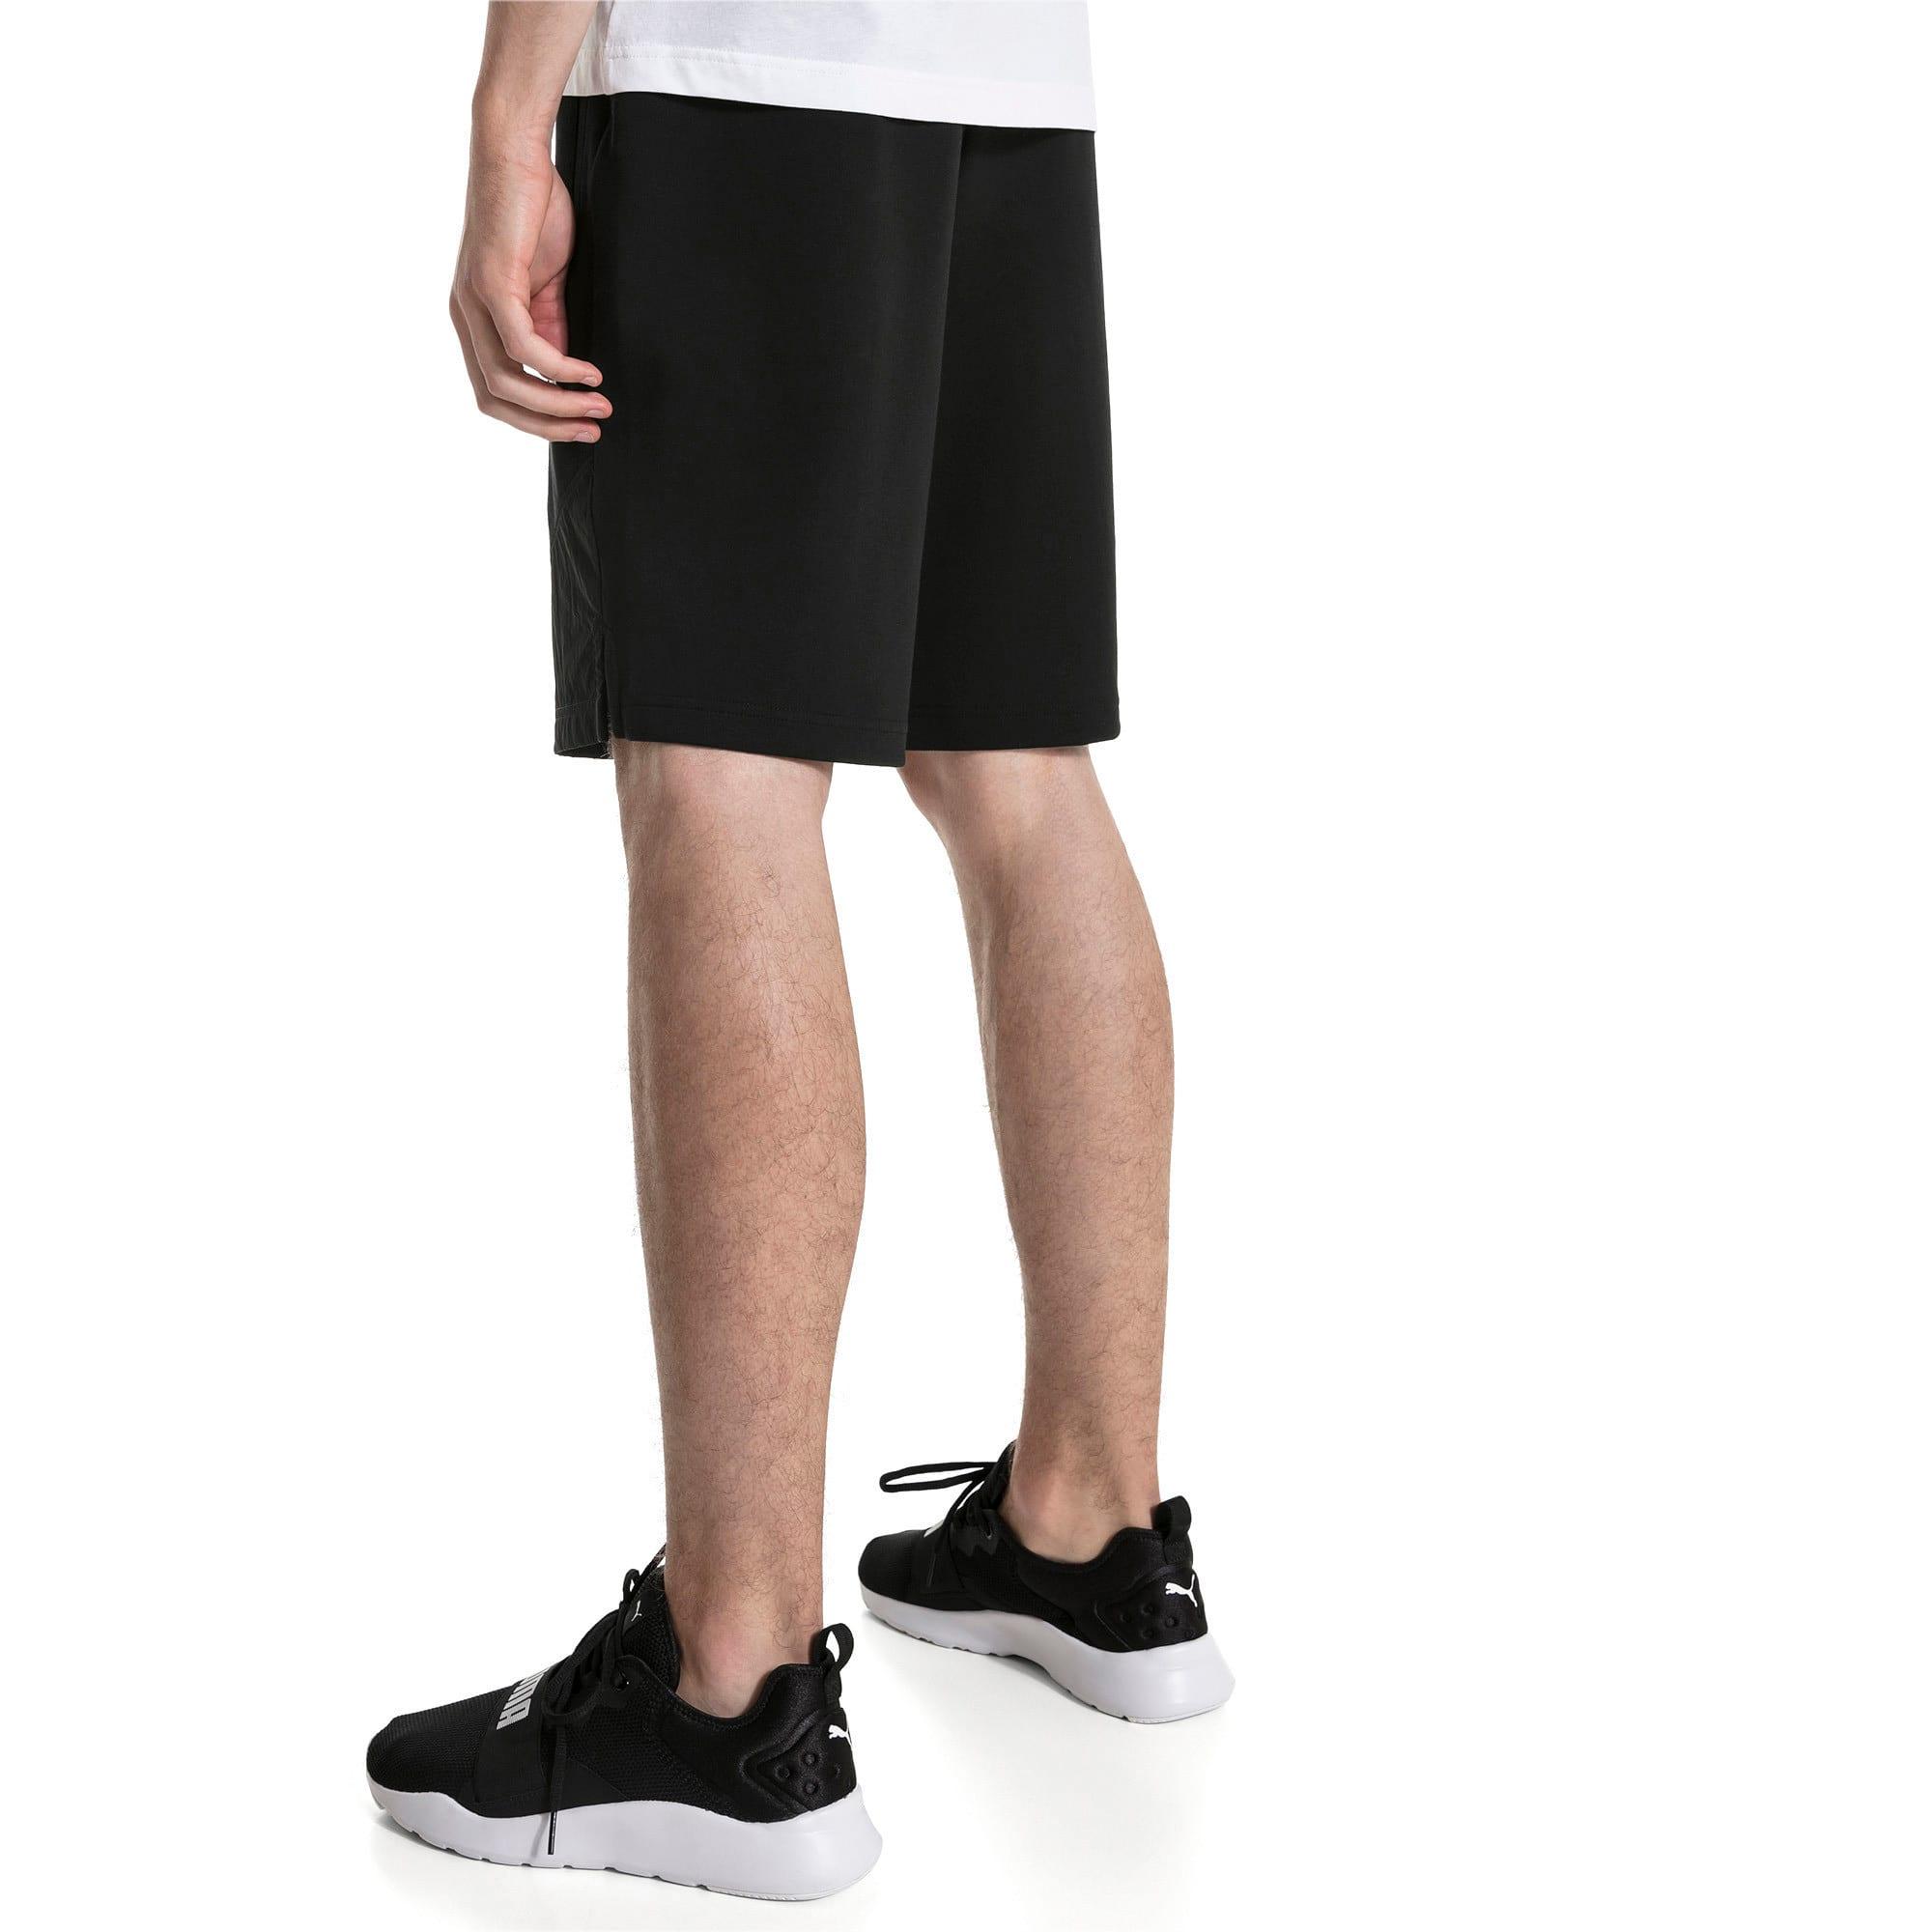 Thumbnail 2 of Evostripe Lite Herren Shorts, Puma Black, medium